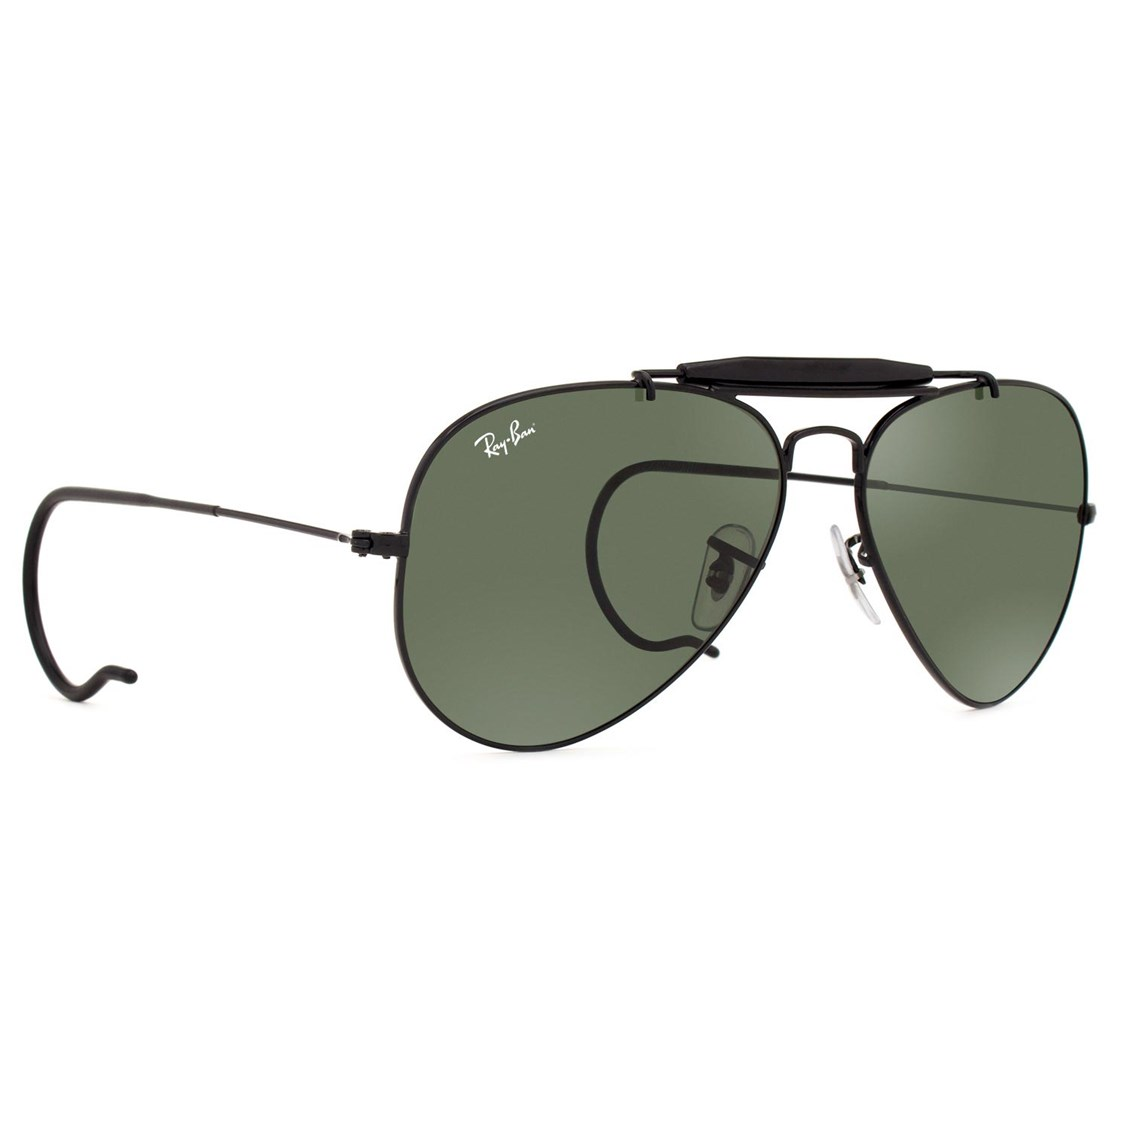 Óculos de Sol Ray Ban Outdoorsman RB3030 L9500-58